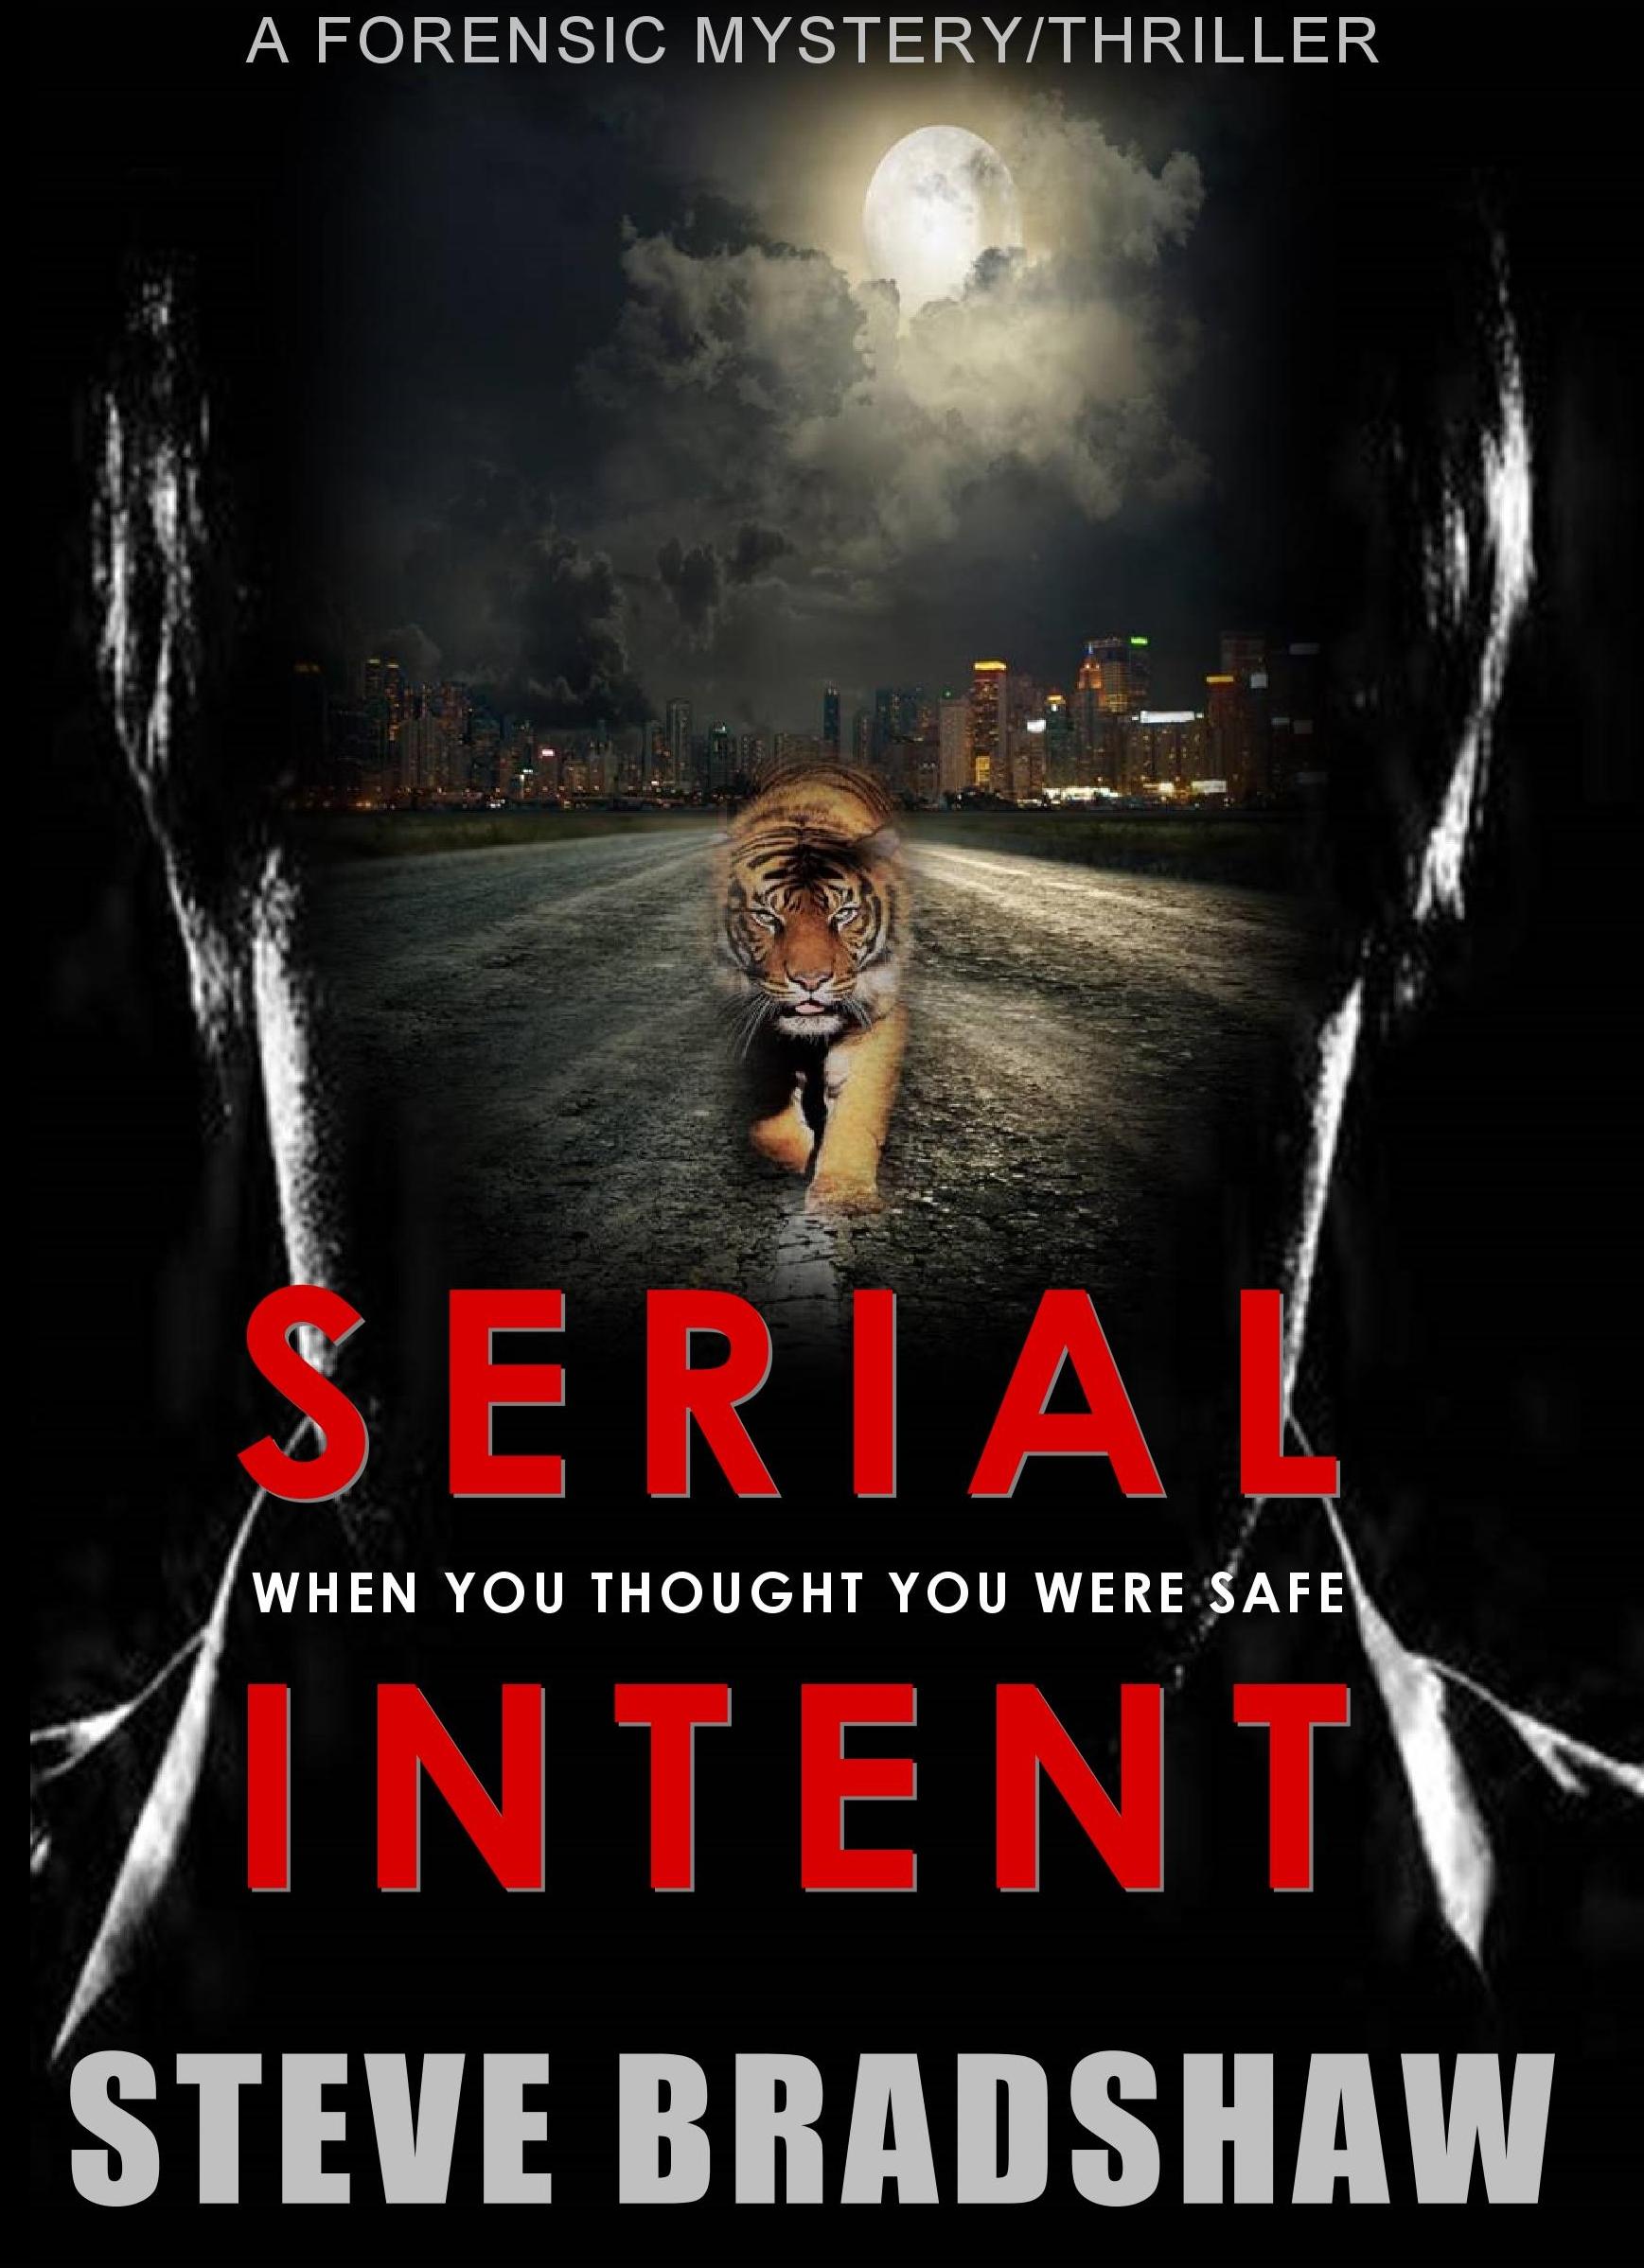 Serial Intent